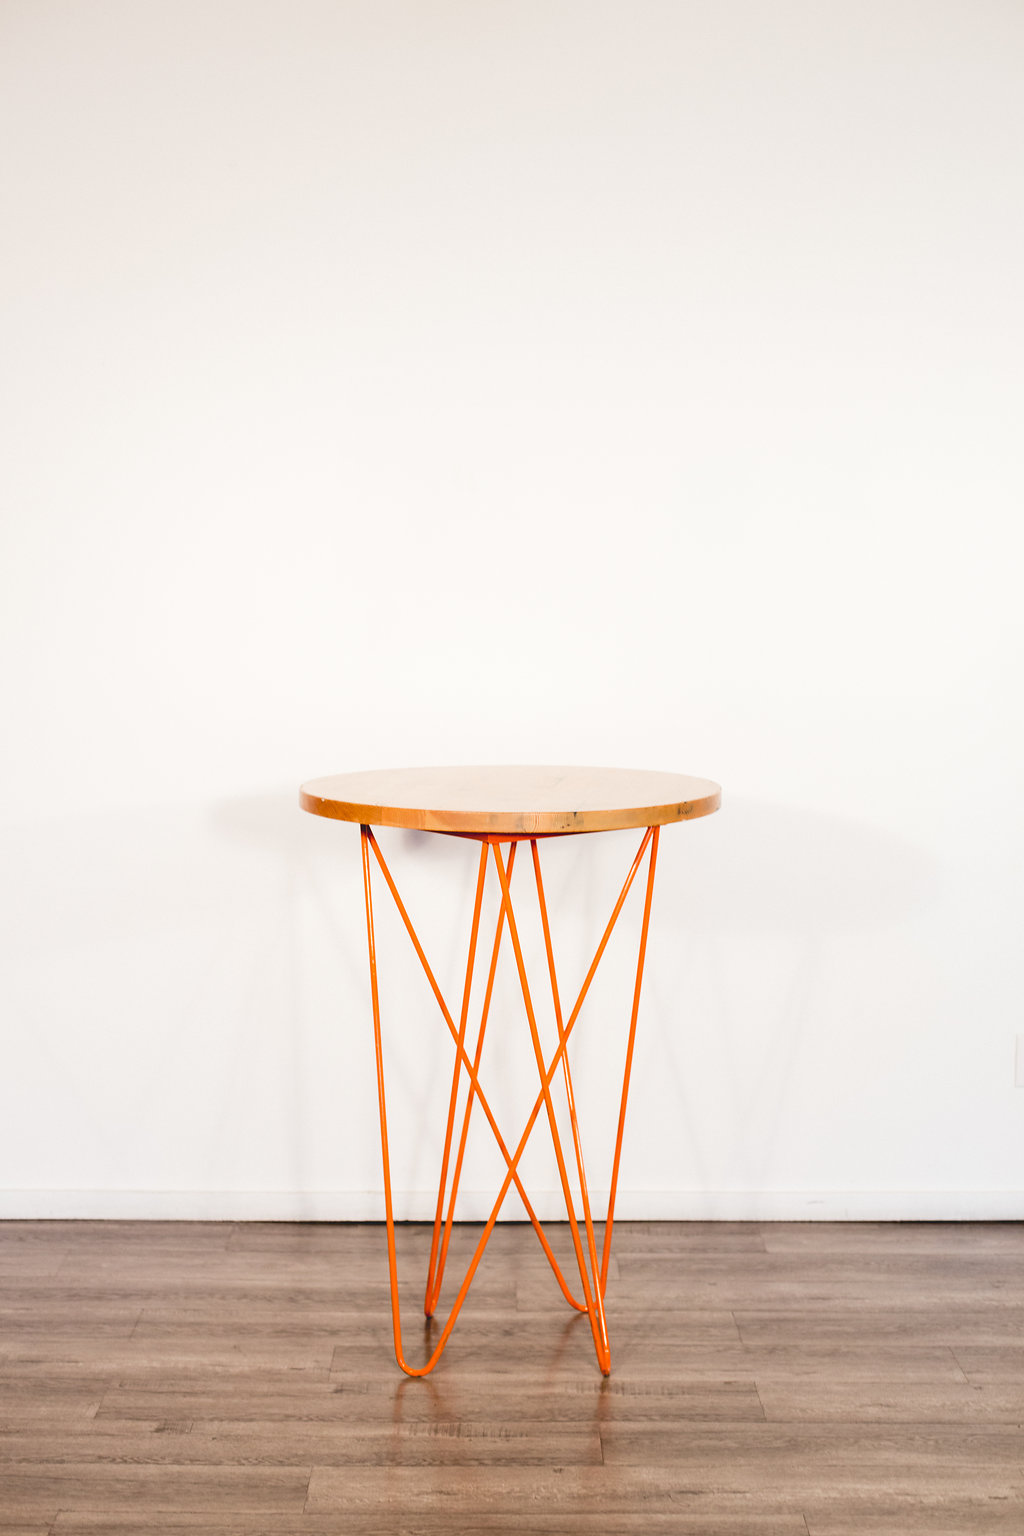 Orange Cocktail Table Quantity: 2 Price: $40 Each